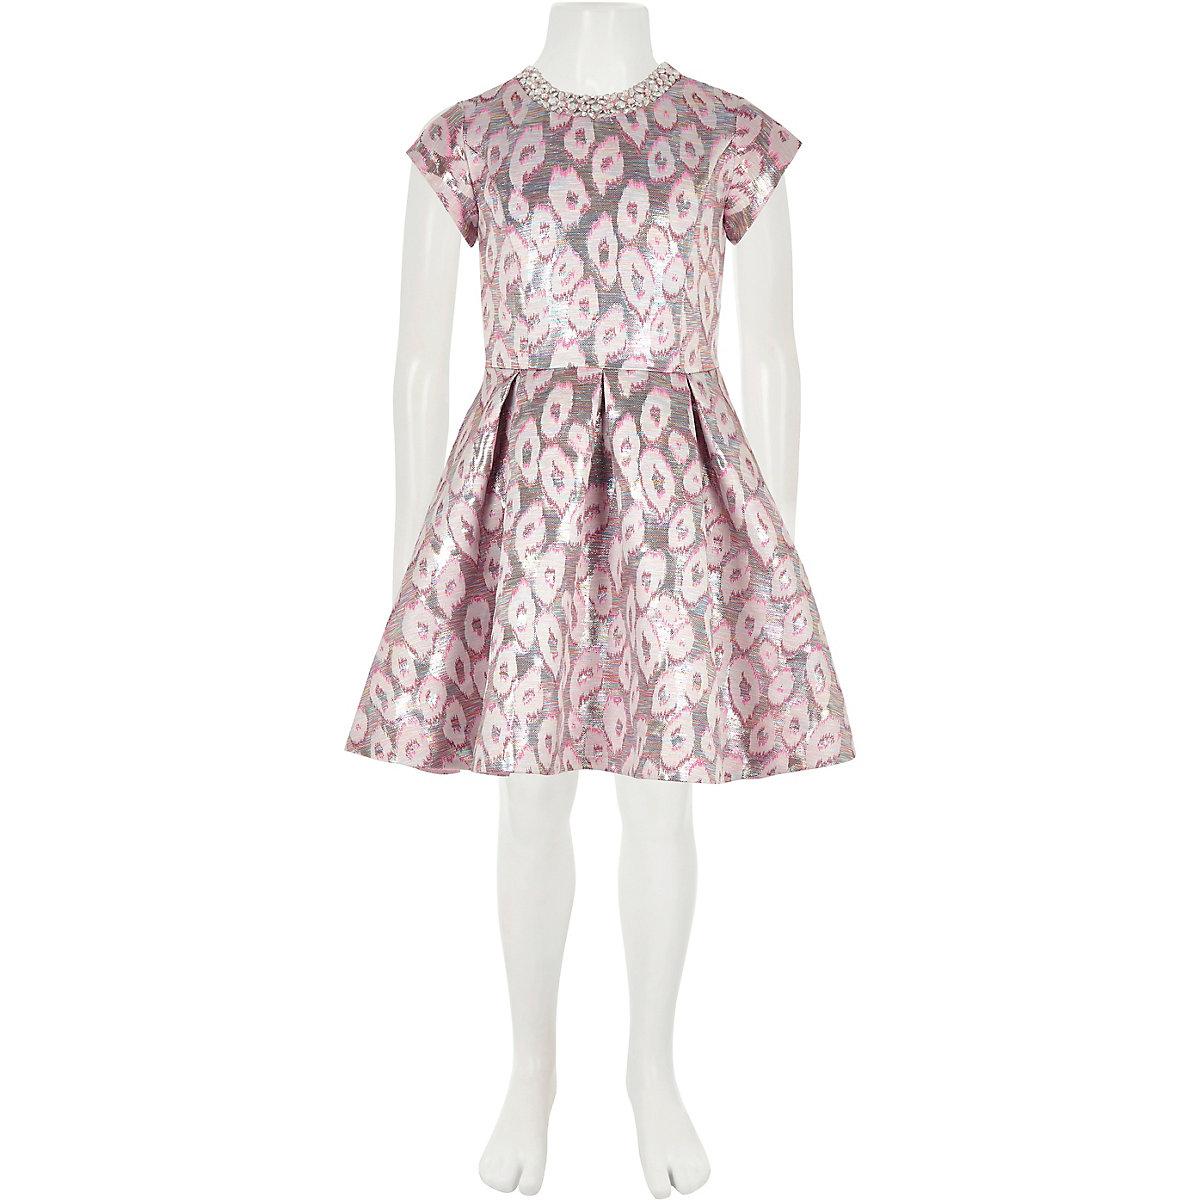 Girls pink leopard print jacquard prom dress - Party Dresses ... d36926822